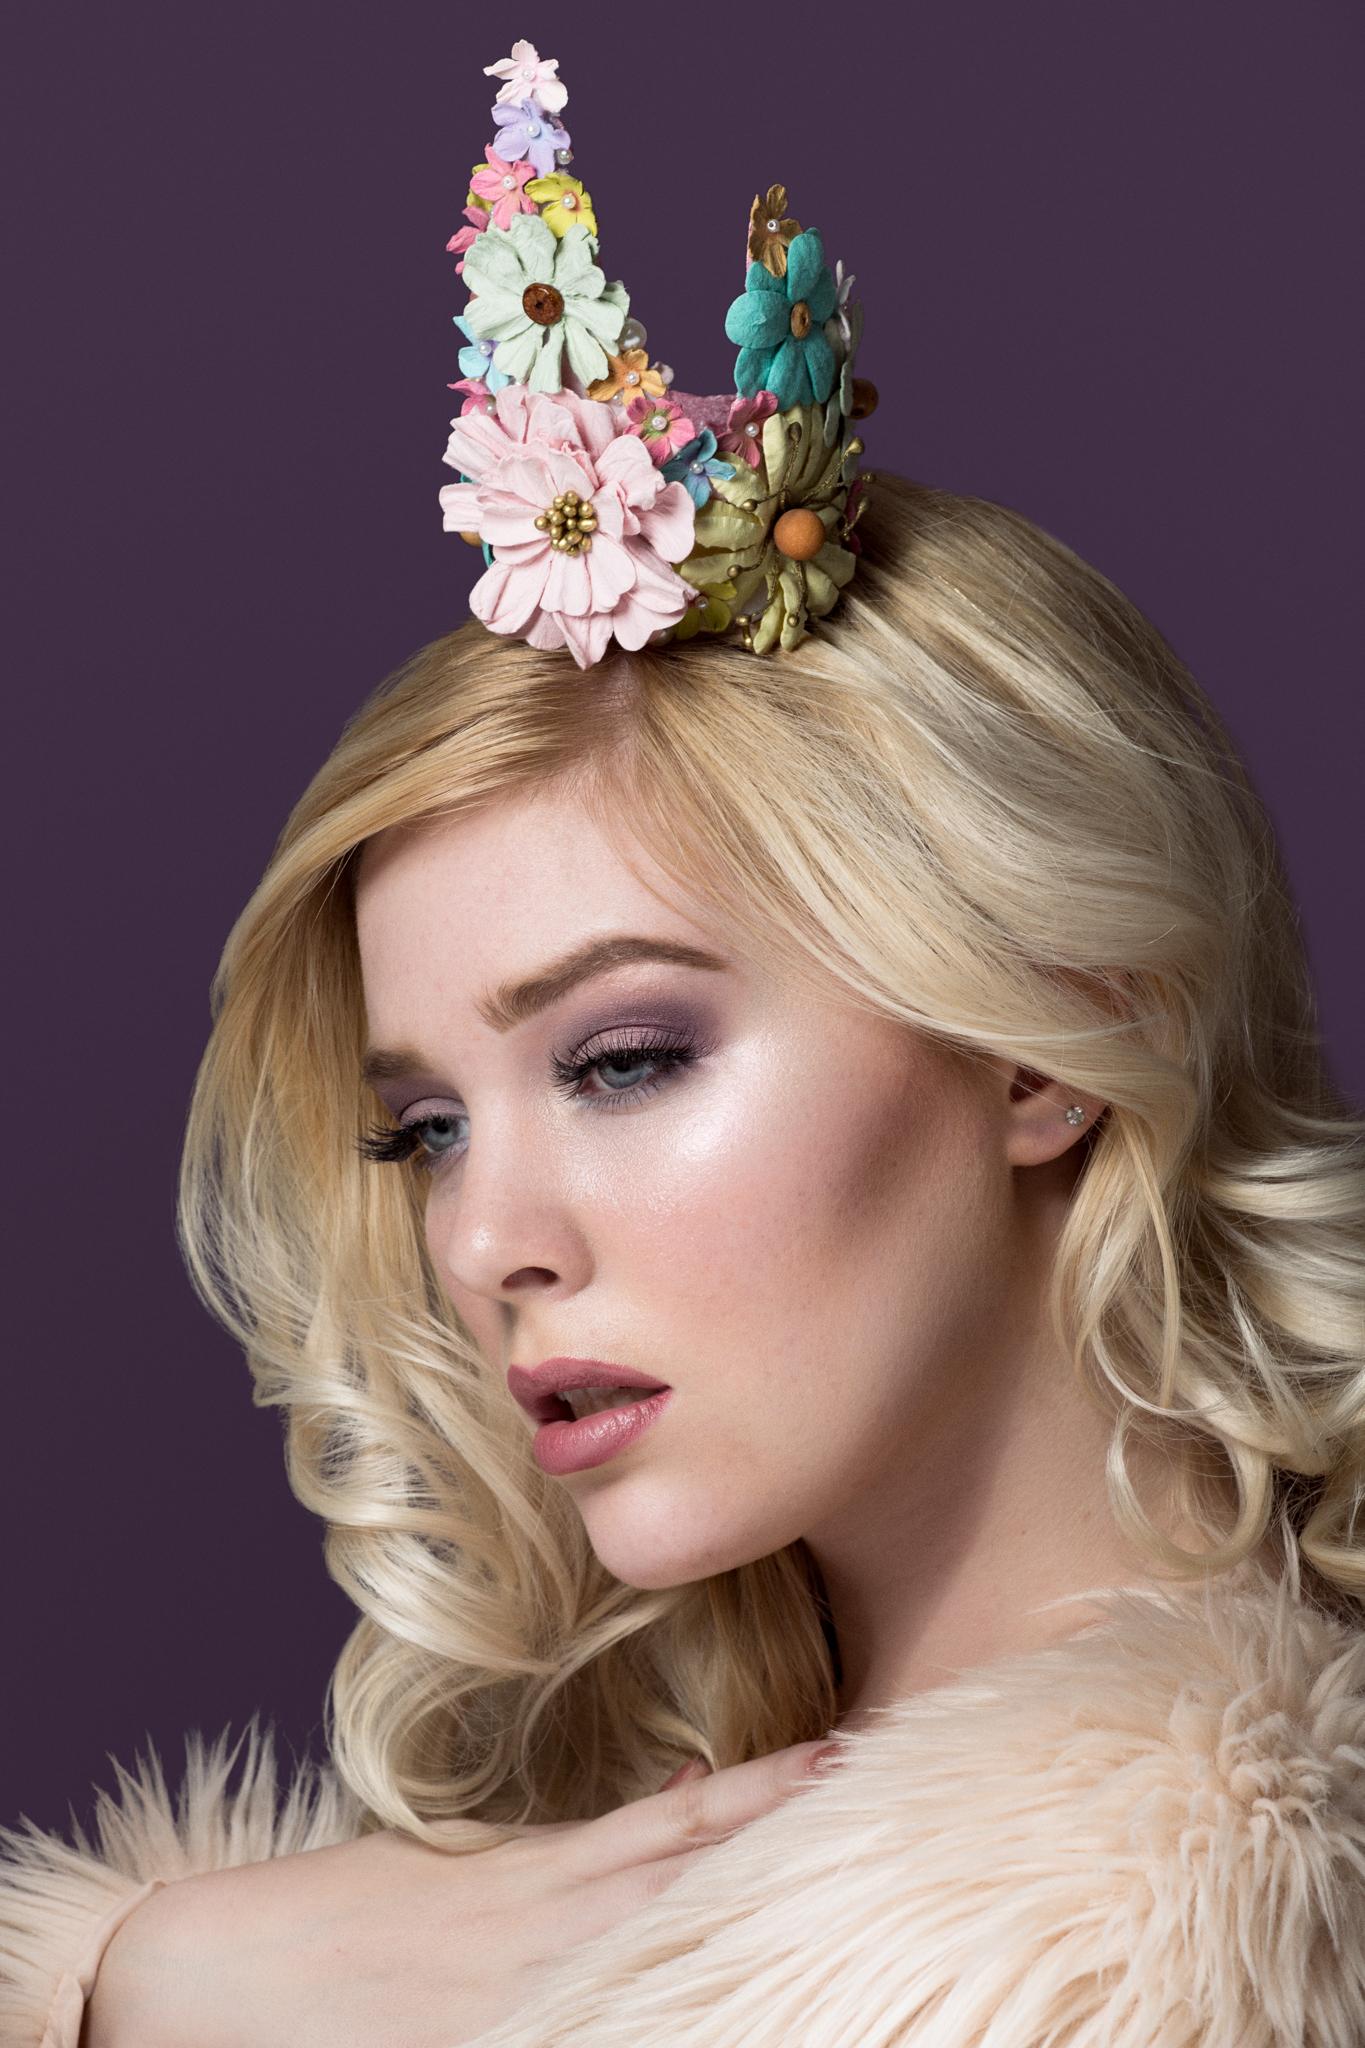 170125_Los Angeles Beauty & Product Photographer_2017-01-25 Katie Phillips_IMG_0605-Edit.jpg